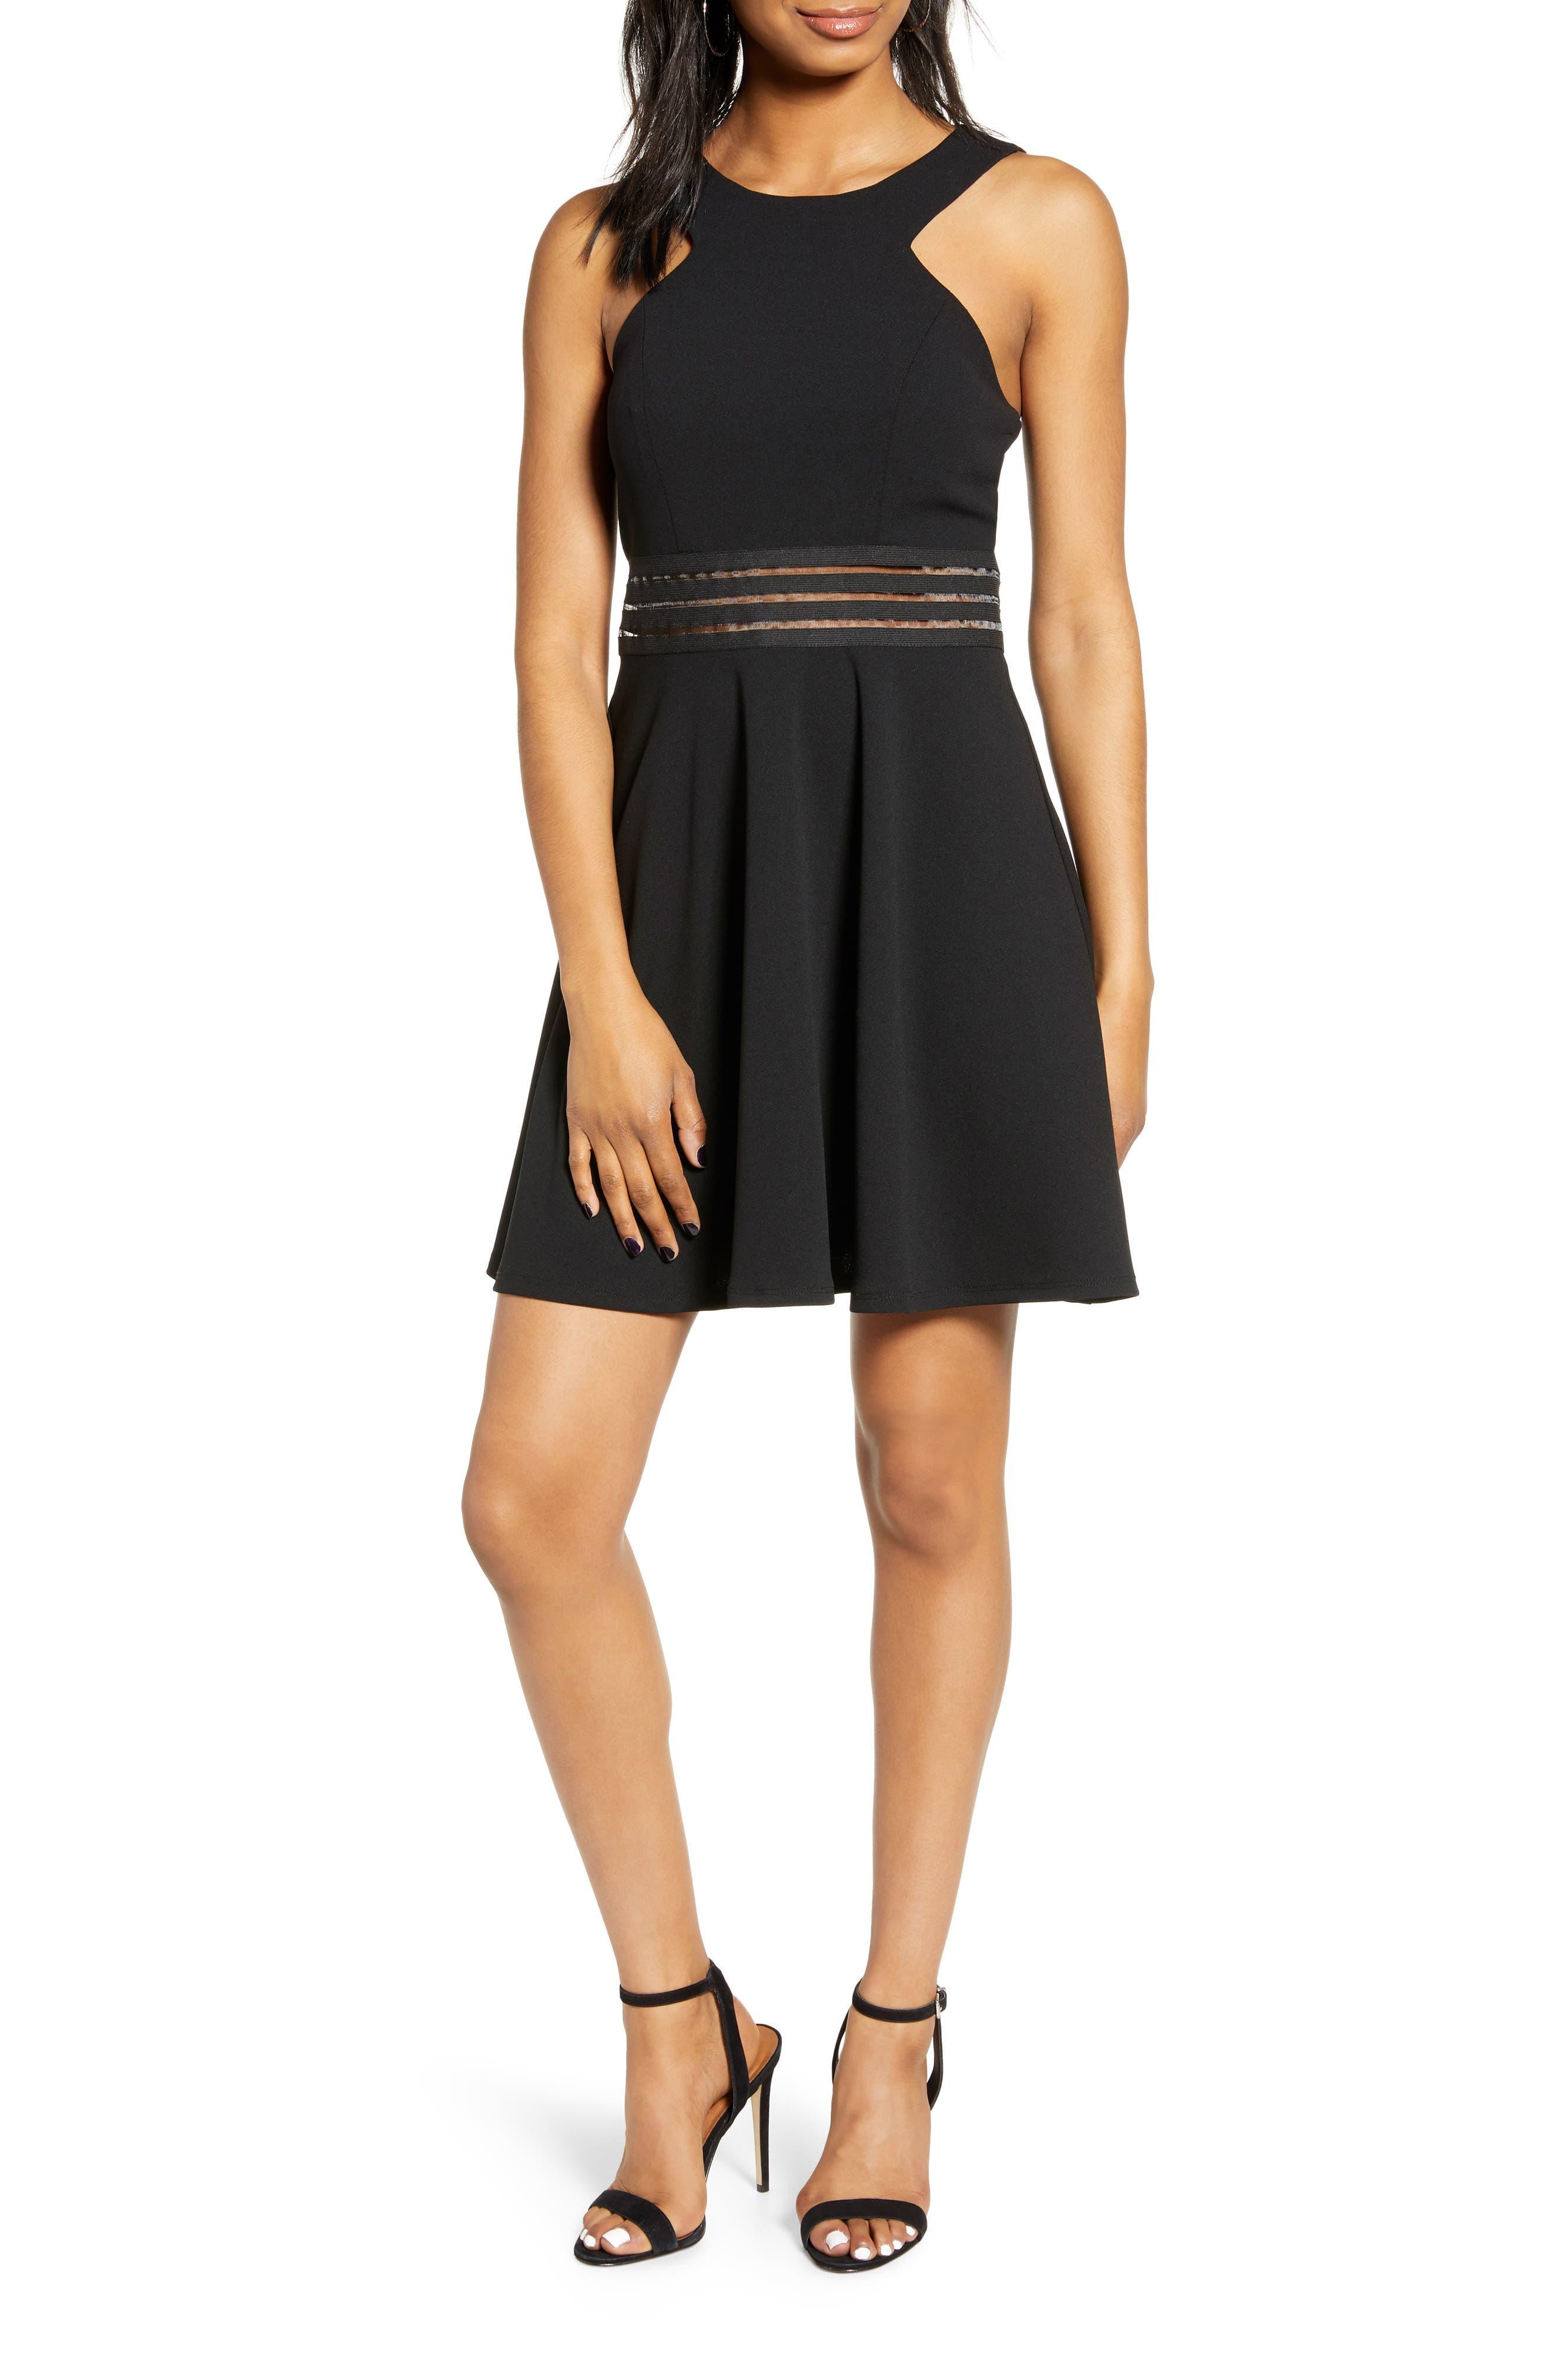 Speechless Illusion Detail Cutout Skater Dress, Black